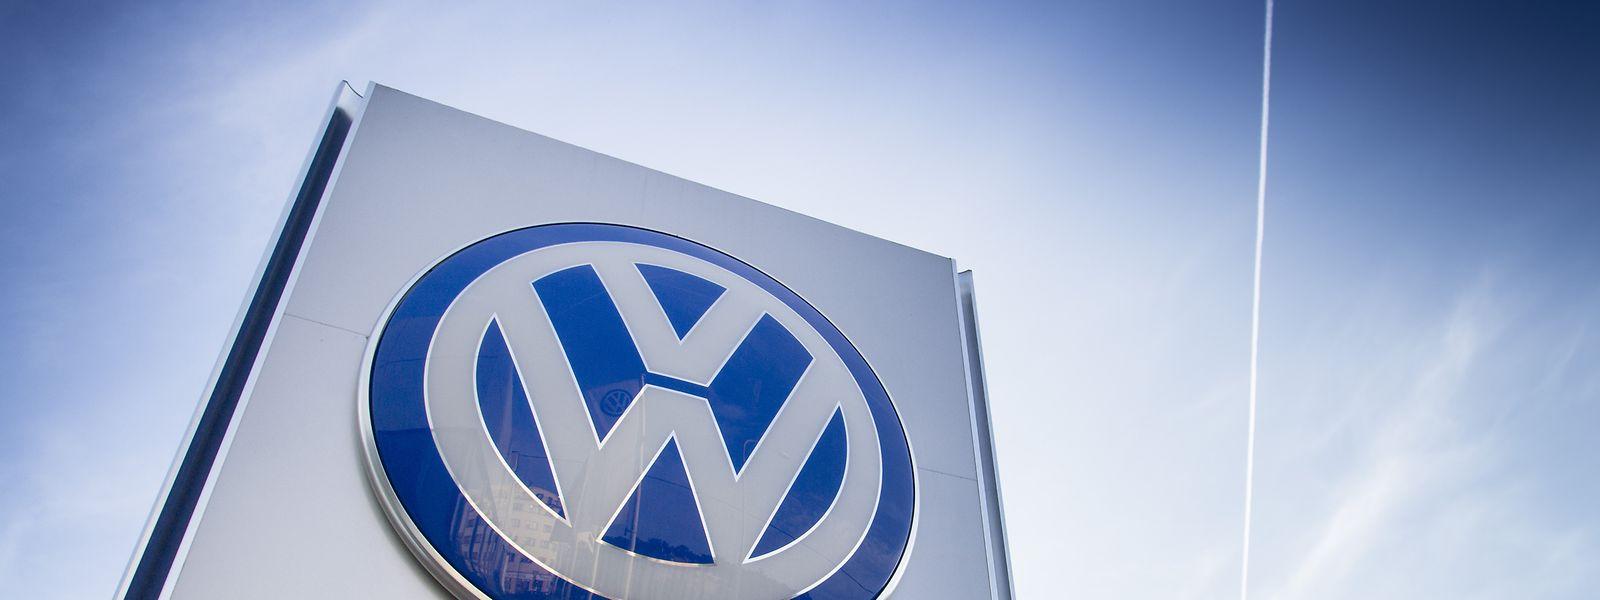 Die US-Großbank JPMorgan übernimmt dem Vertrag zufolge knapp 75 Prozent an der Plattform Volkswagen Payments.